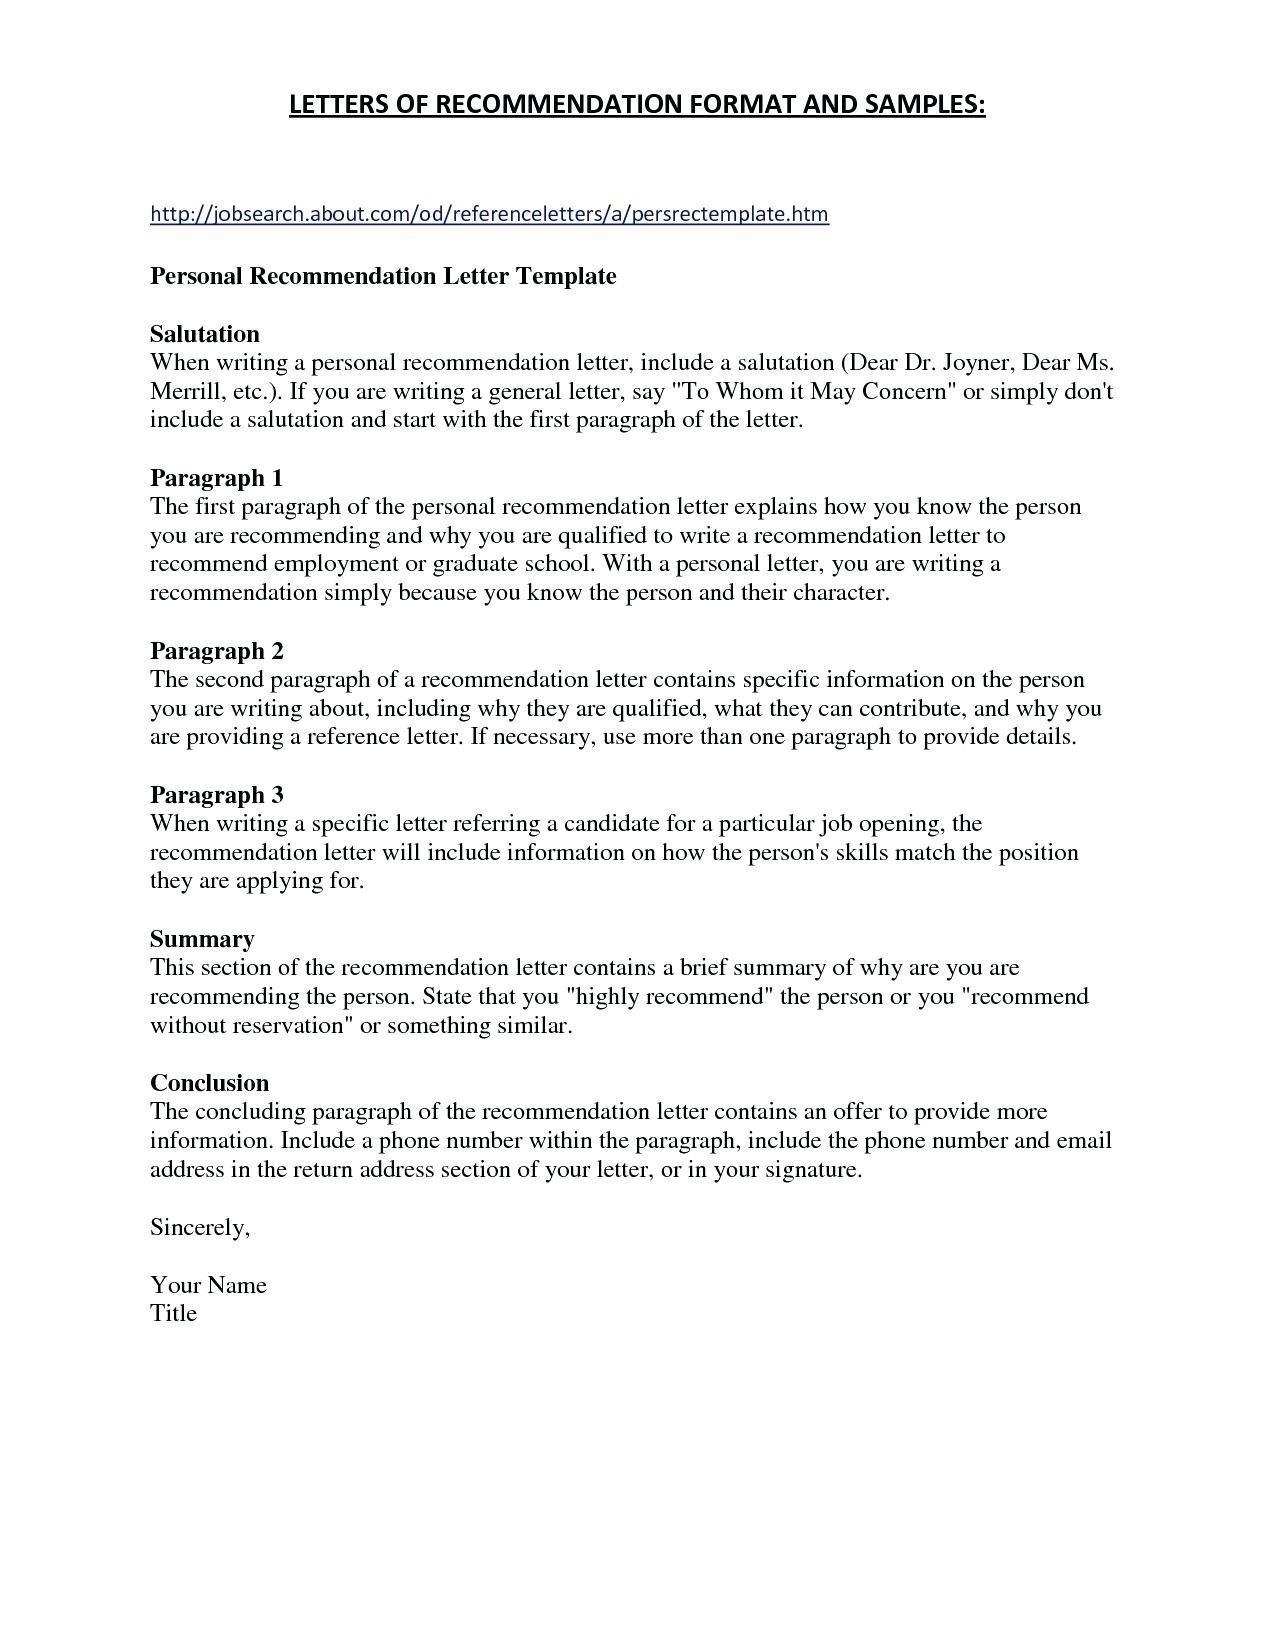 Back to School Letter Template - Job Fer Cancellation Letter Fresh Job Fer Cancellation Letter Best